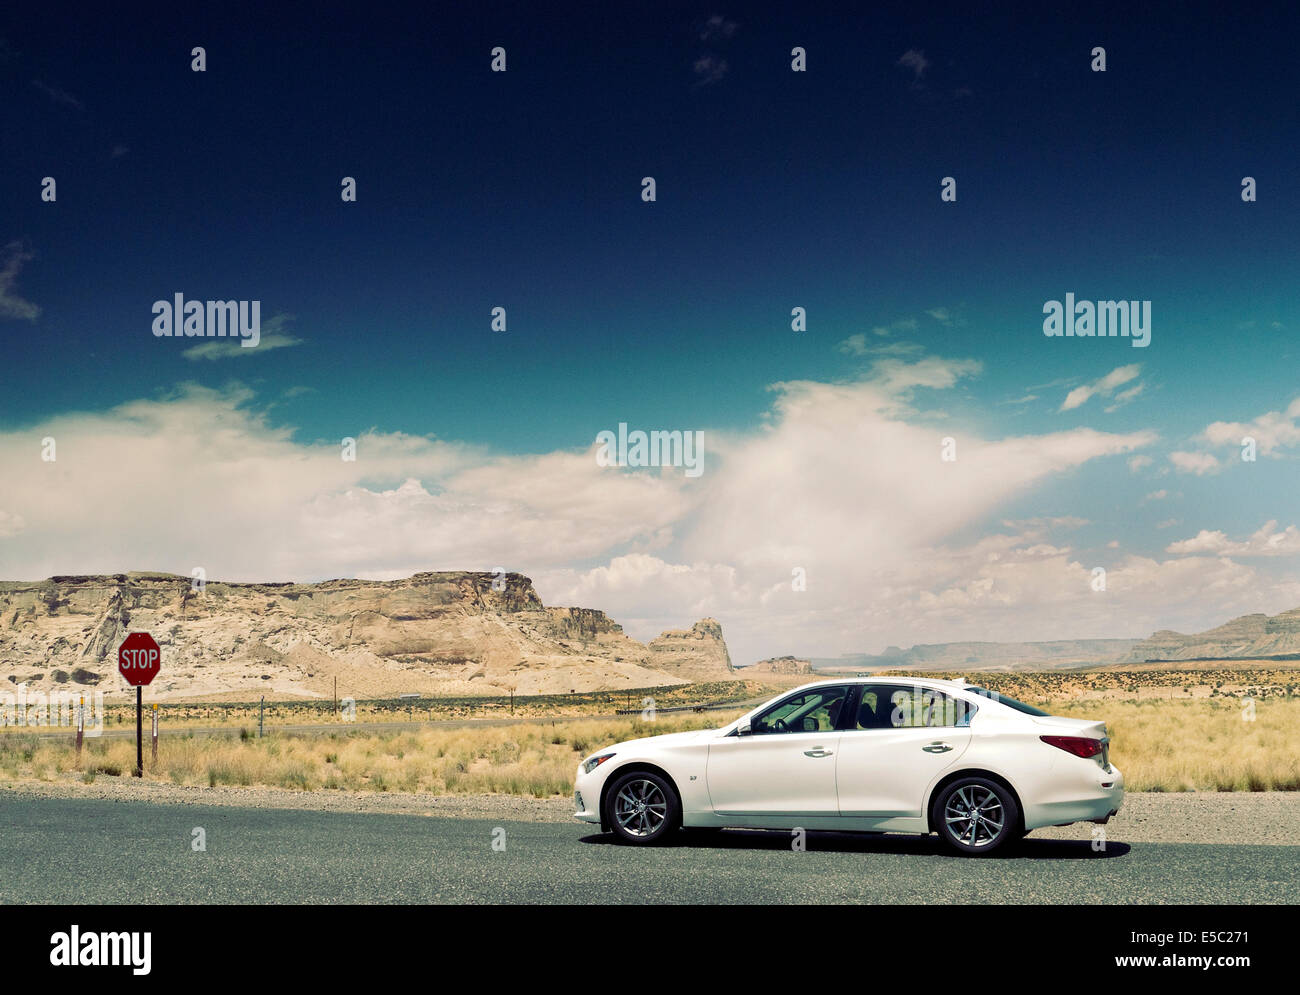 Infiniti Q50 on a desert road near lake Powell Arizona USA - Stock Image